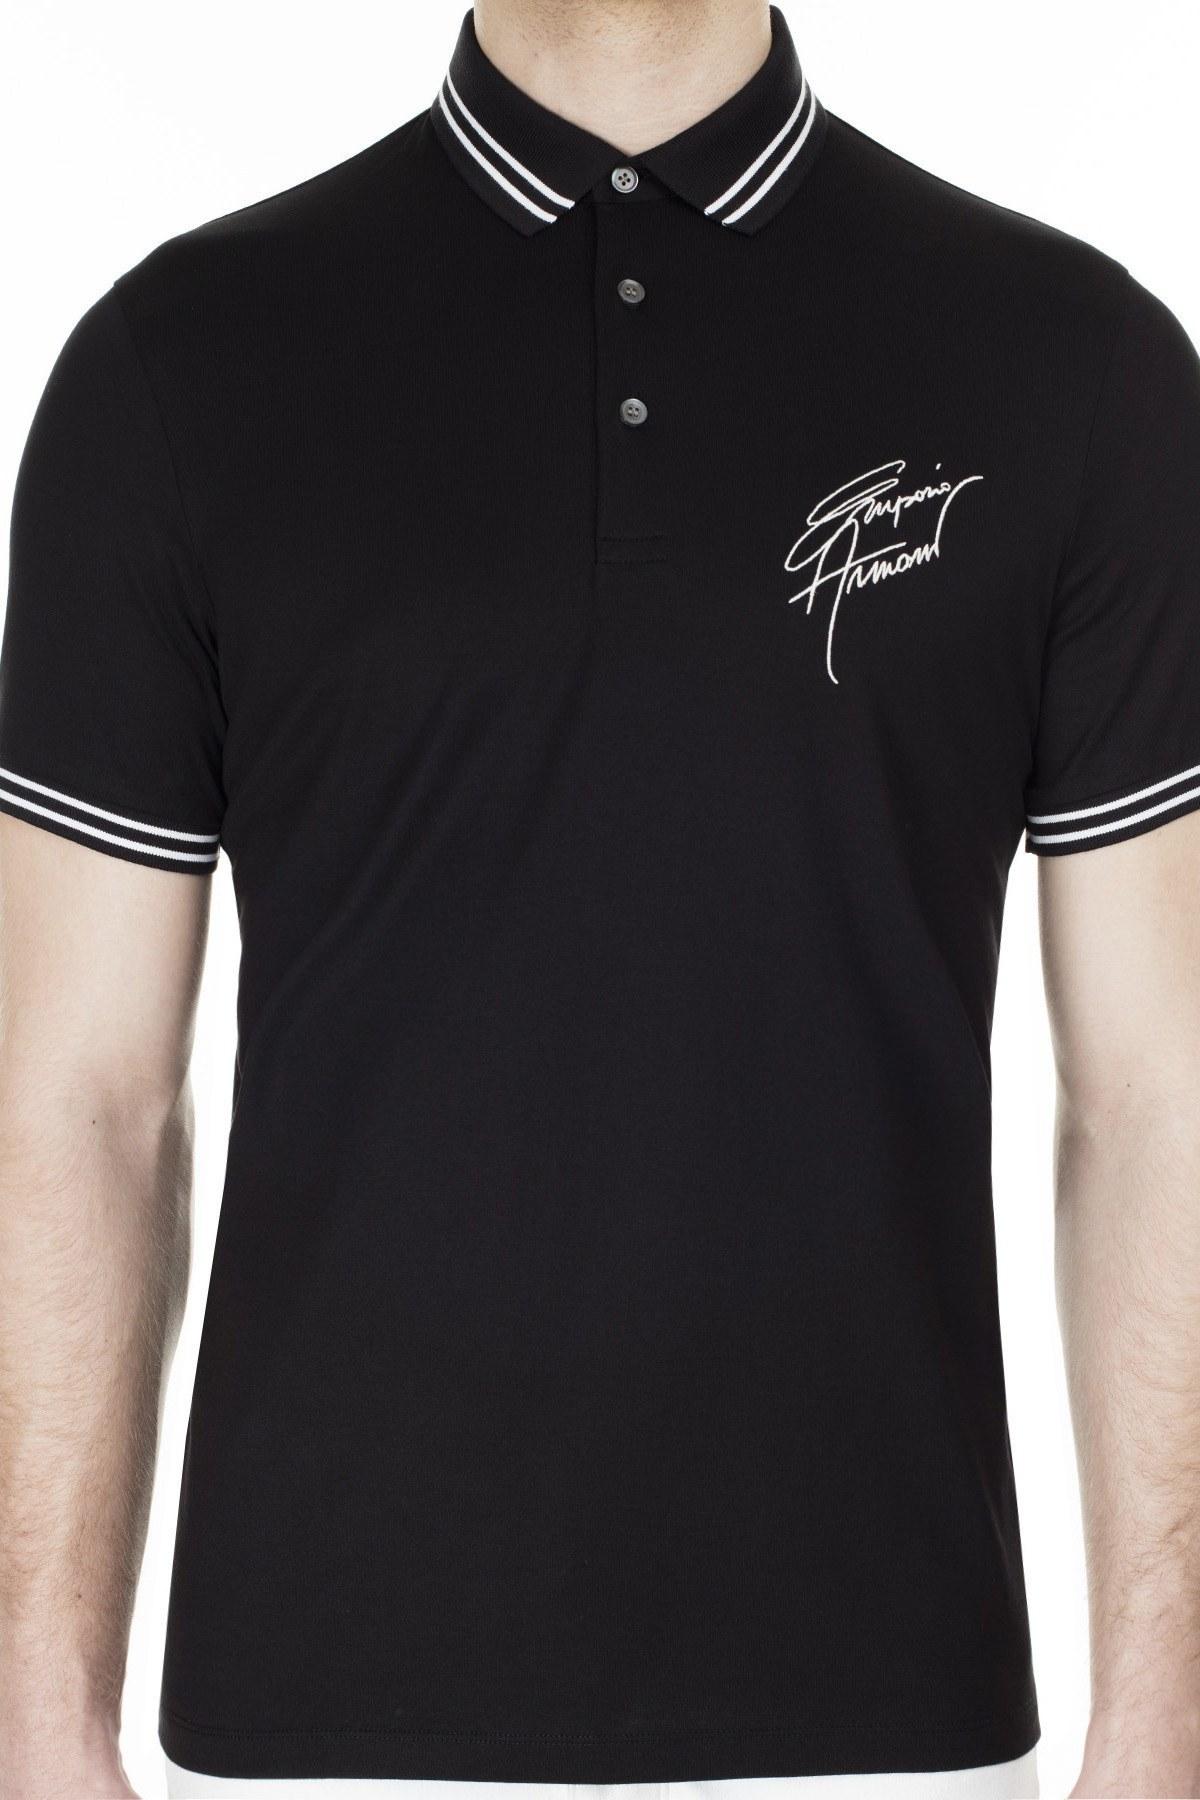 Emporio Armani T Shirt Erkek Polo 3H1FN4 1JCQZ F061 SİYAH